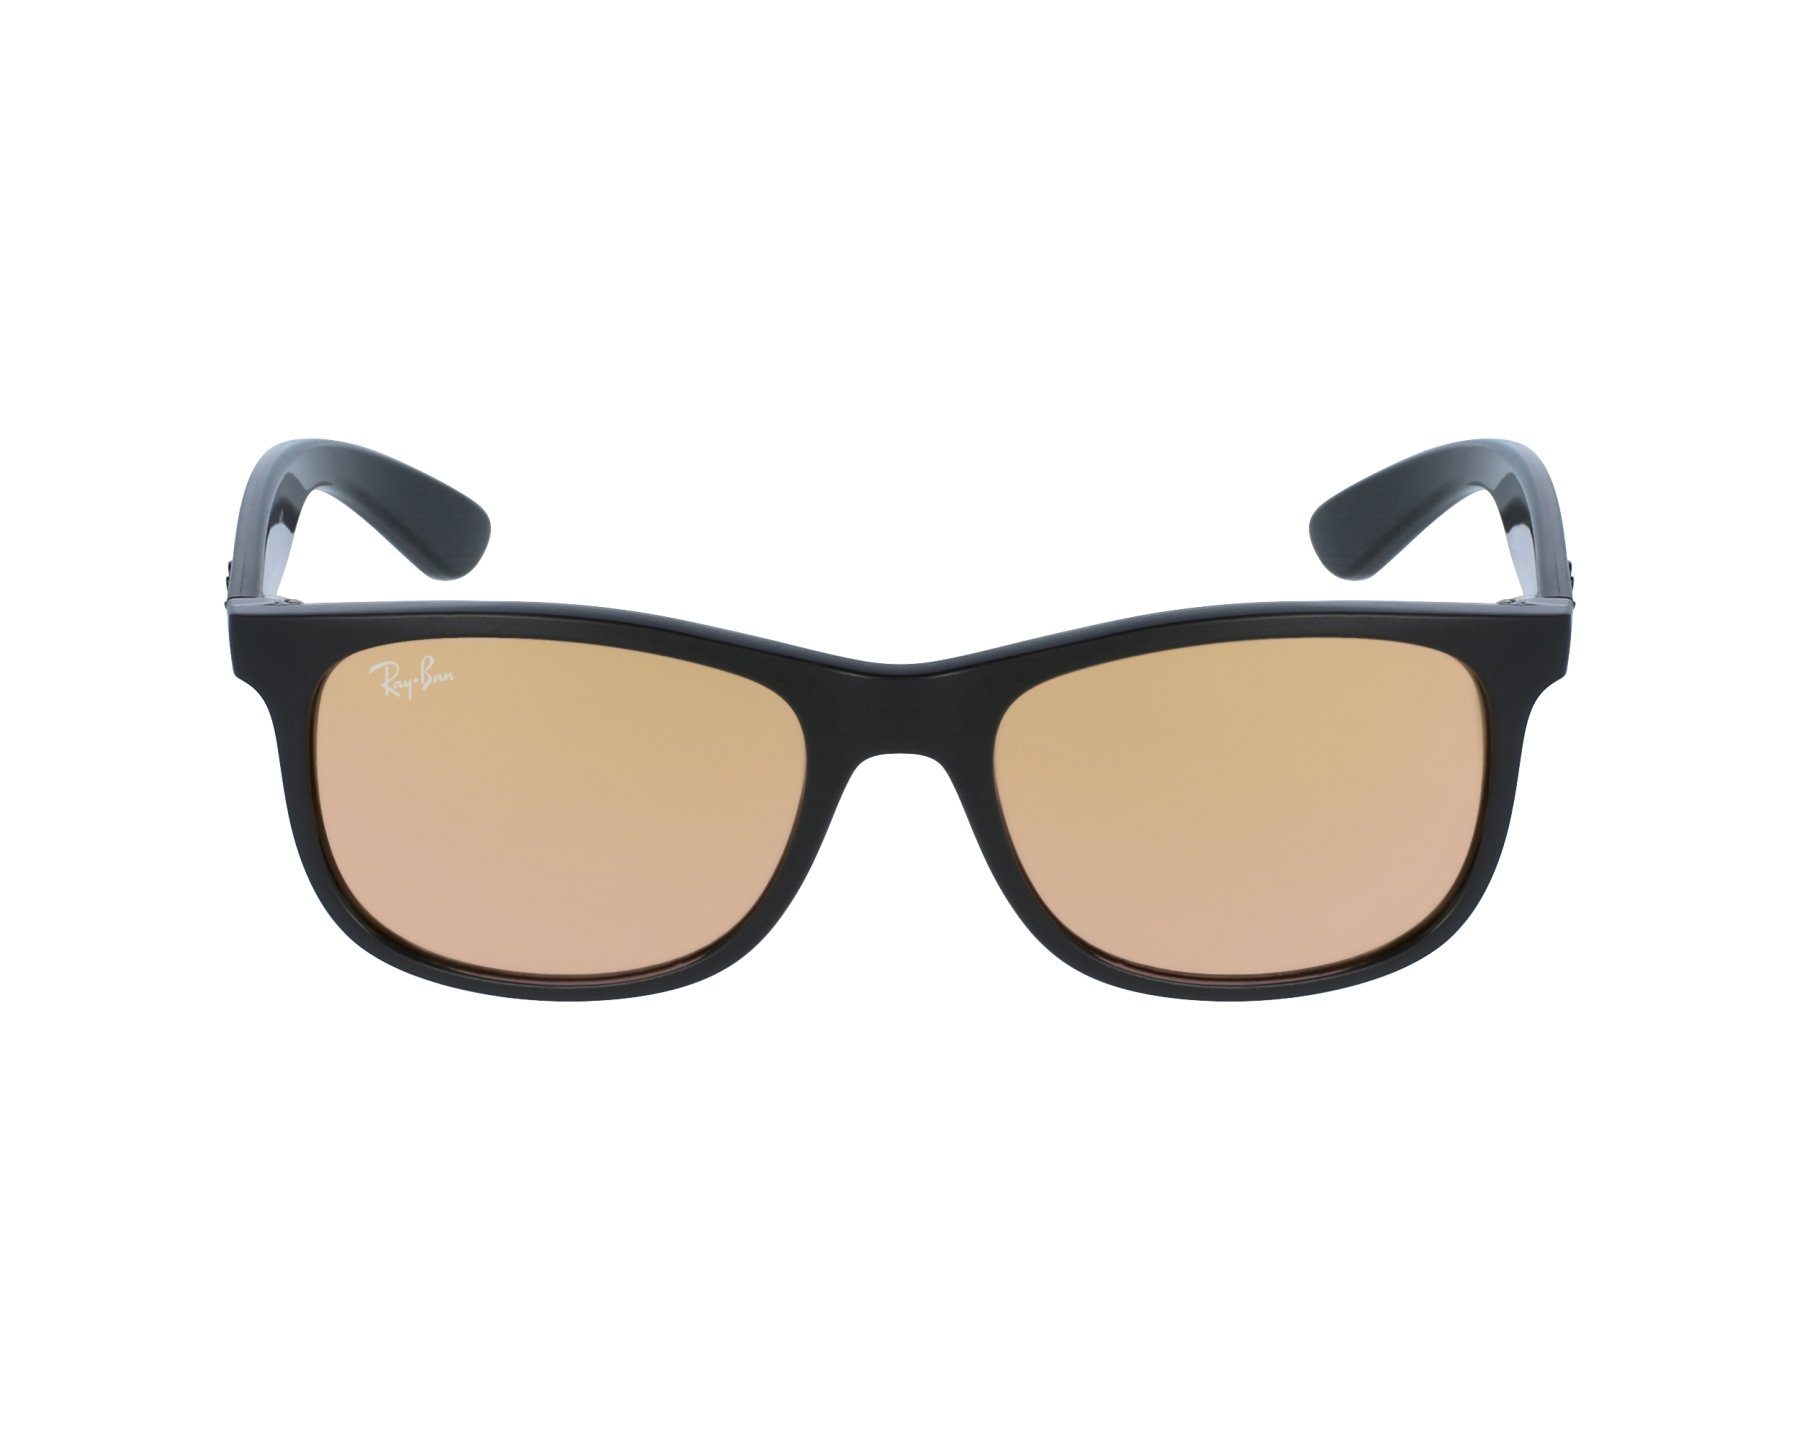 ray ban sonnenbrille junior rj 9062 s 7013 2y. Black Bedroom Furniture Sets. Home Design Ideas